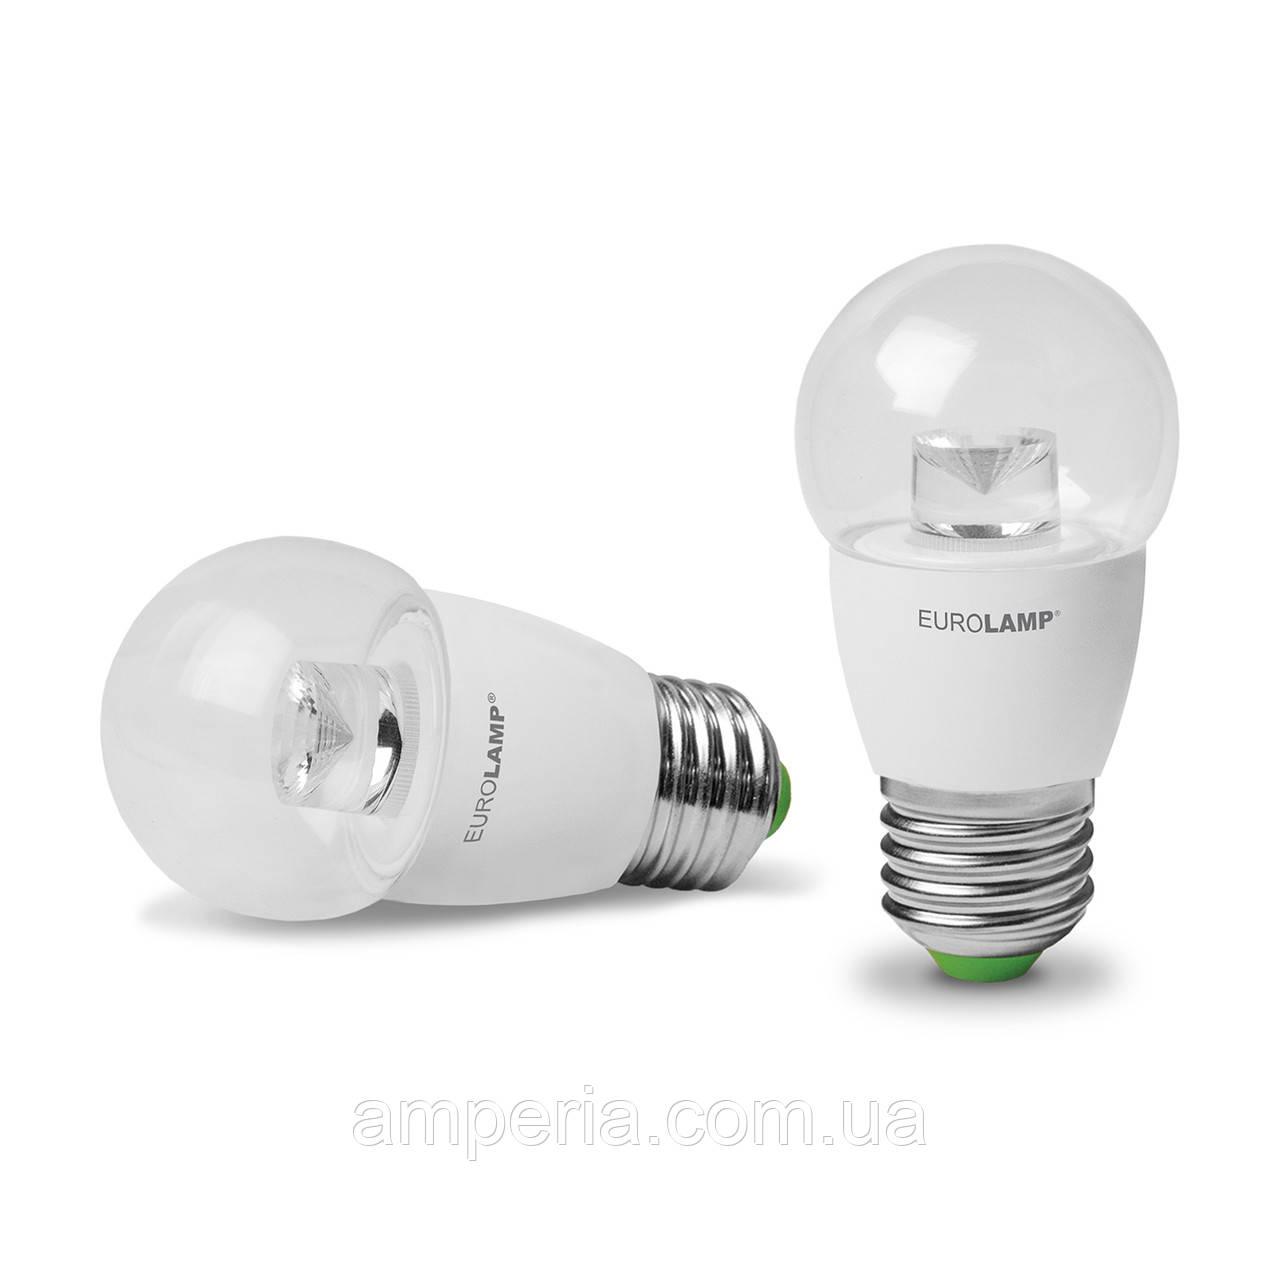 EUROLAMP LED Лампа ЕКО G45 5W E27 4000K(прозрачная) (LED-G45-05274(D)clear)